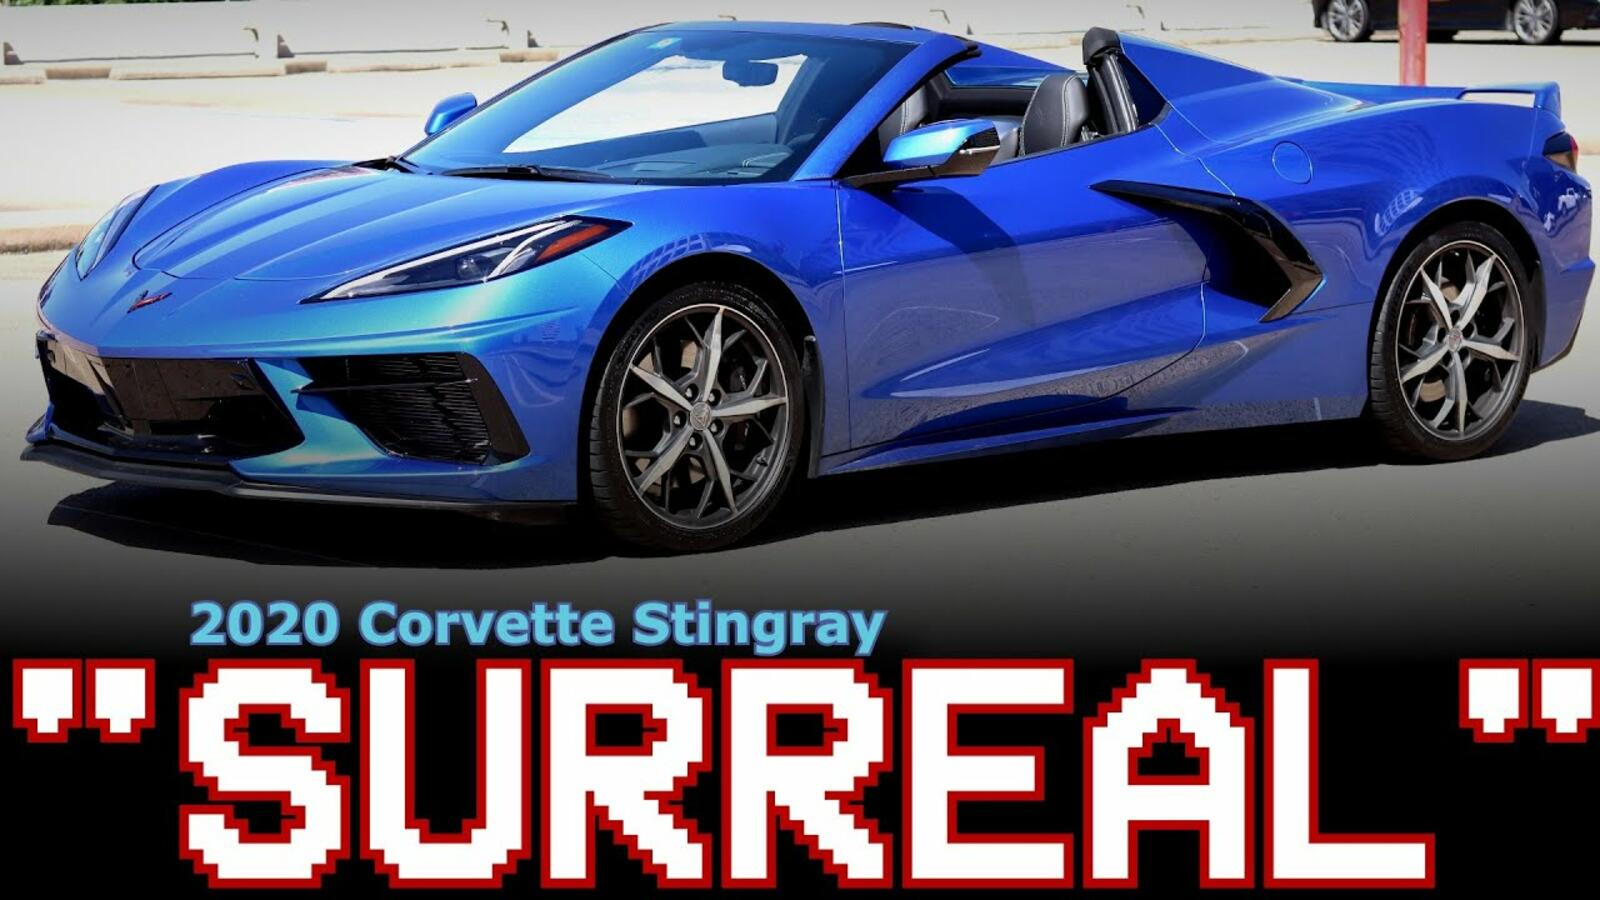 VIDEO   Stung by the new 2020 Corvette Stingray